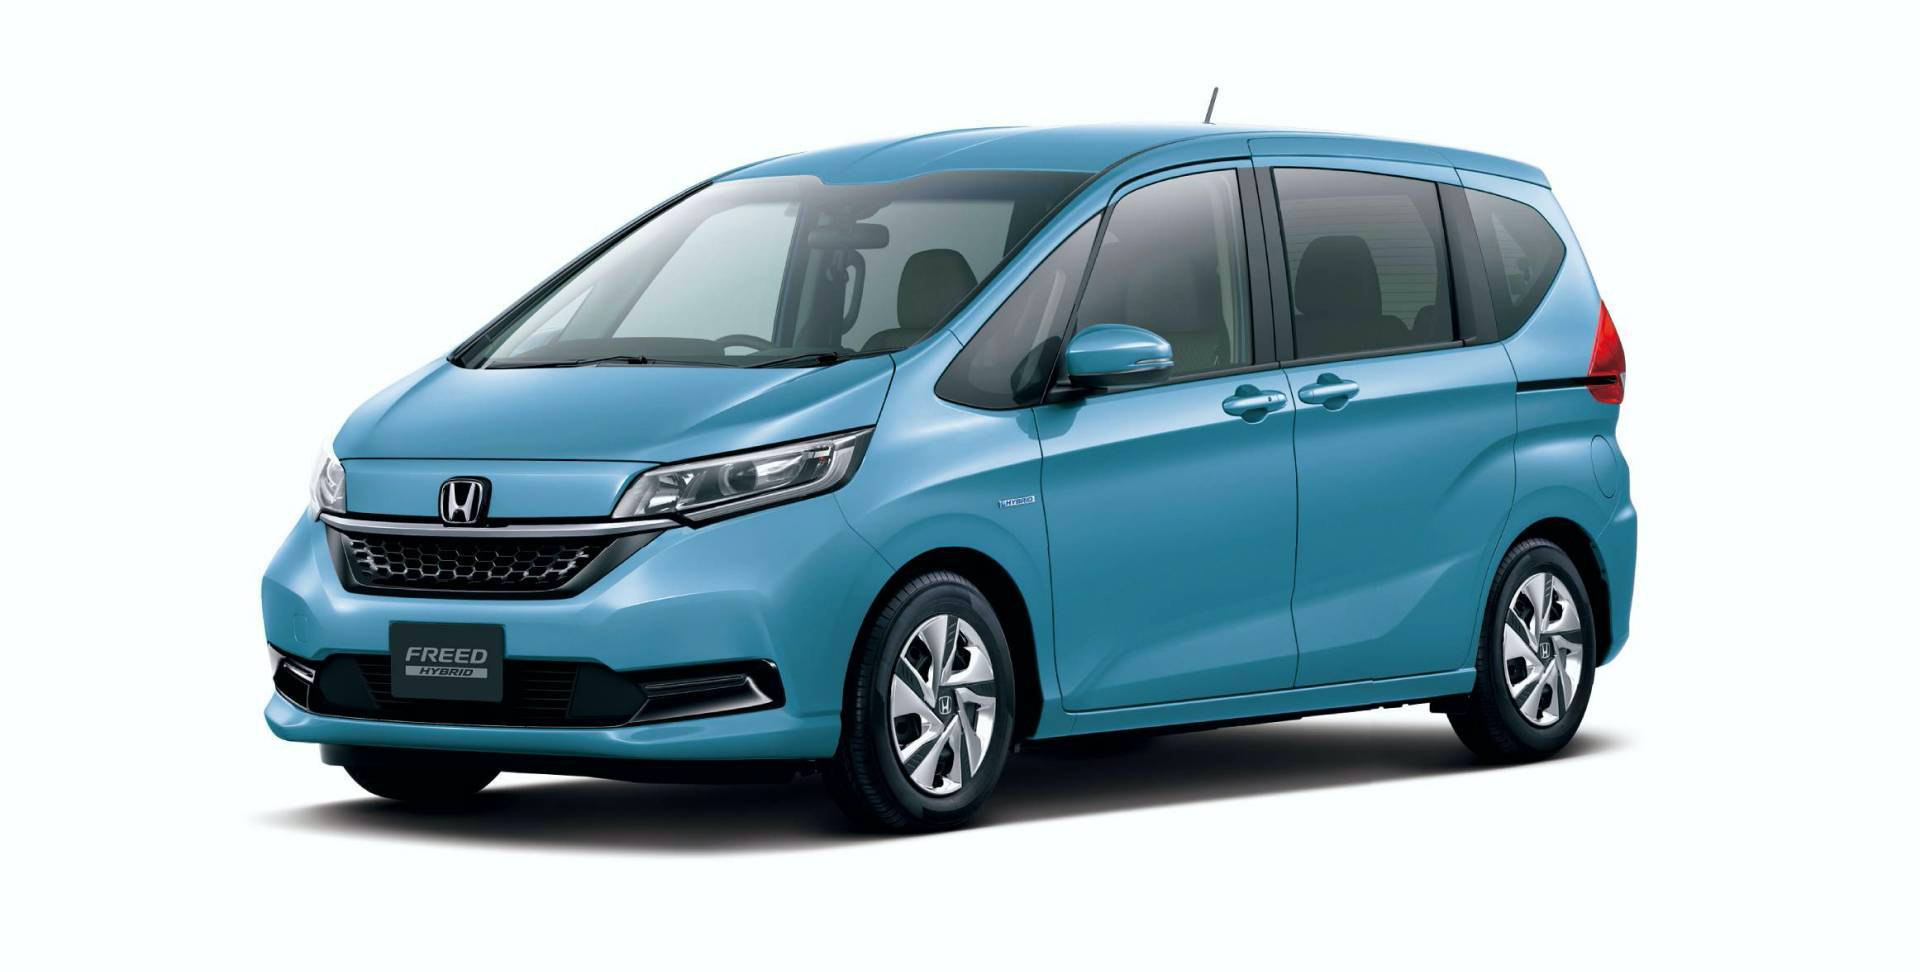 Honda-Freed-2020-19